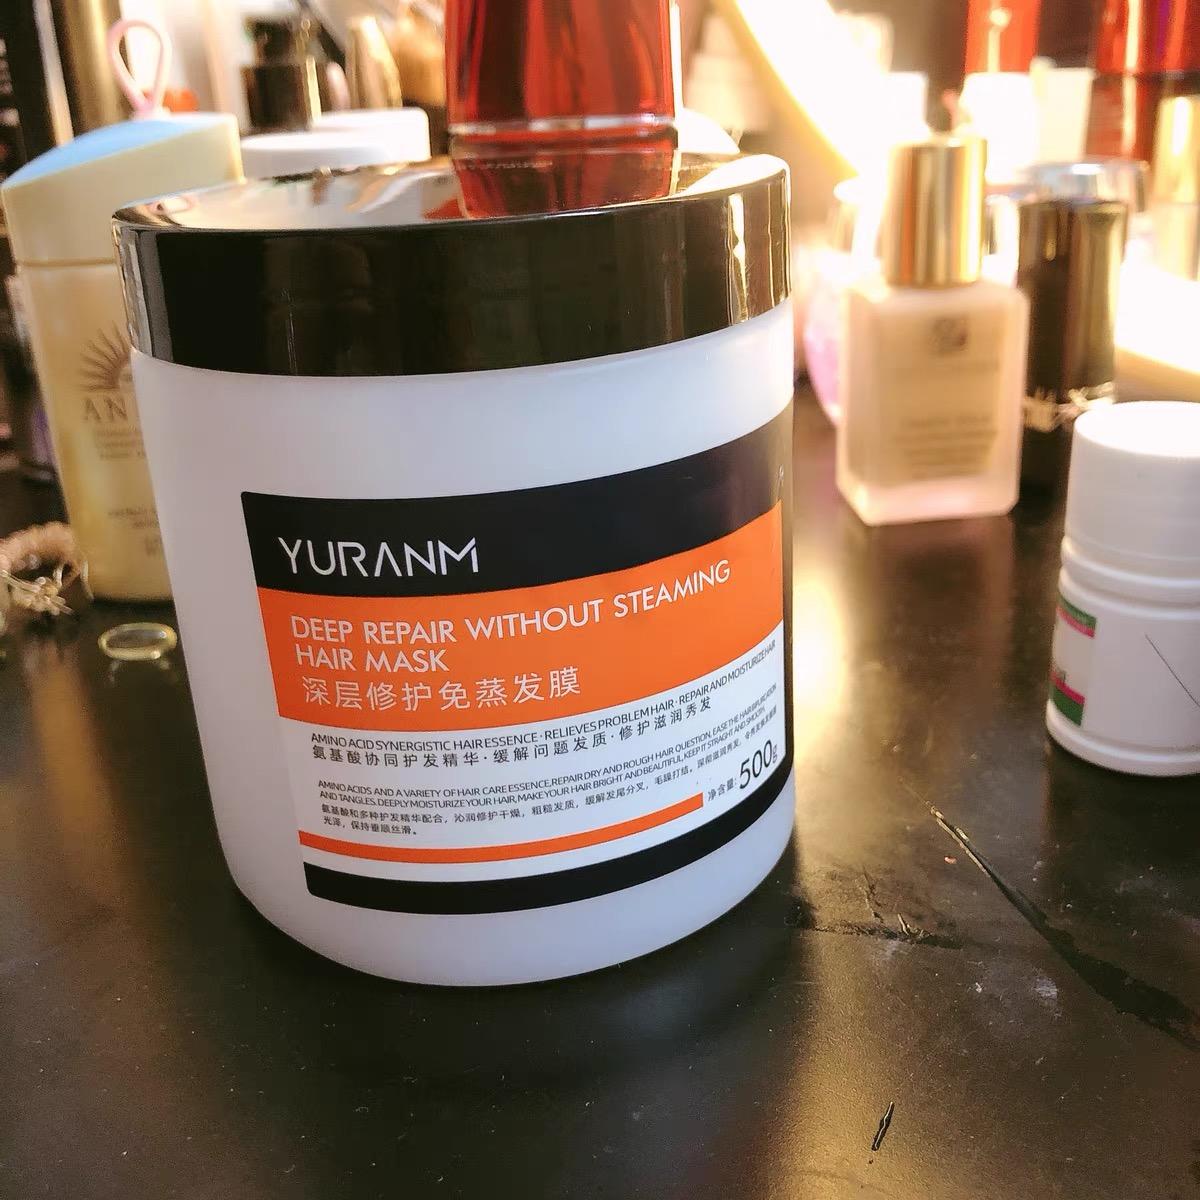 Yuranm瑜然美深层修护免蒸发膜